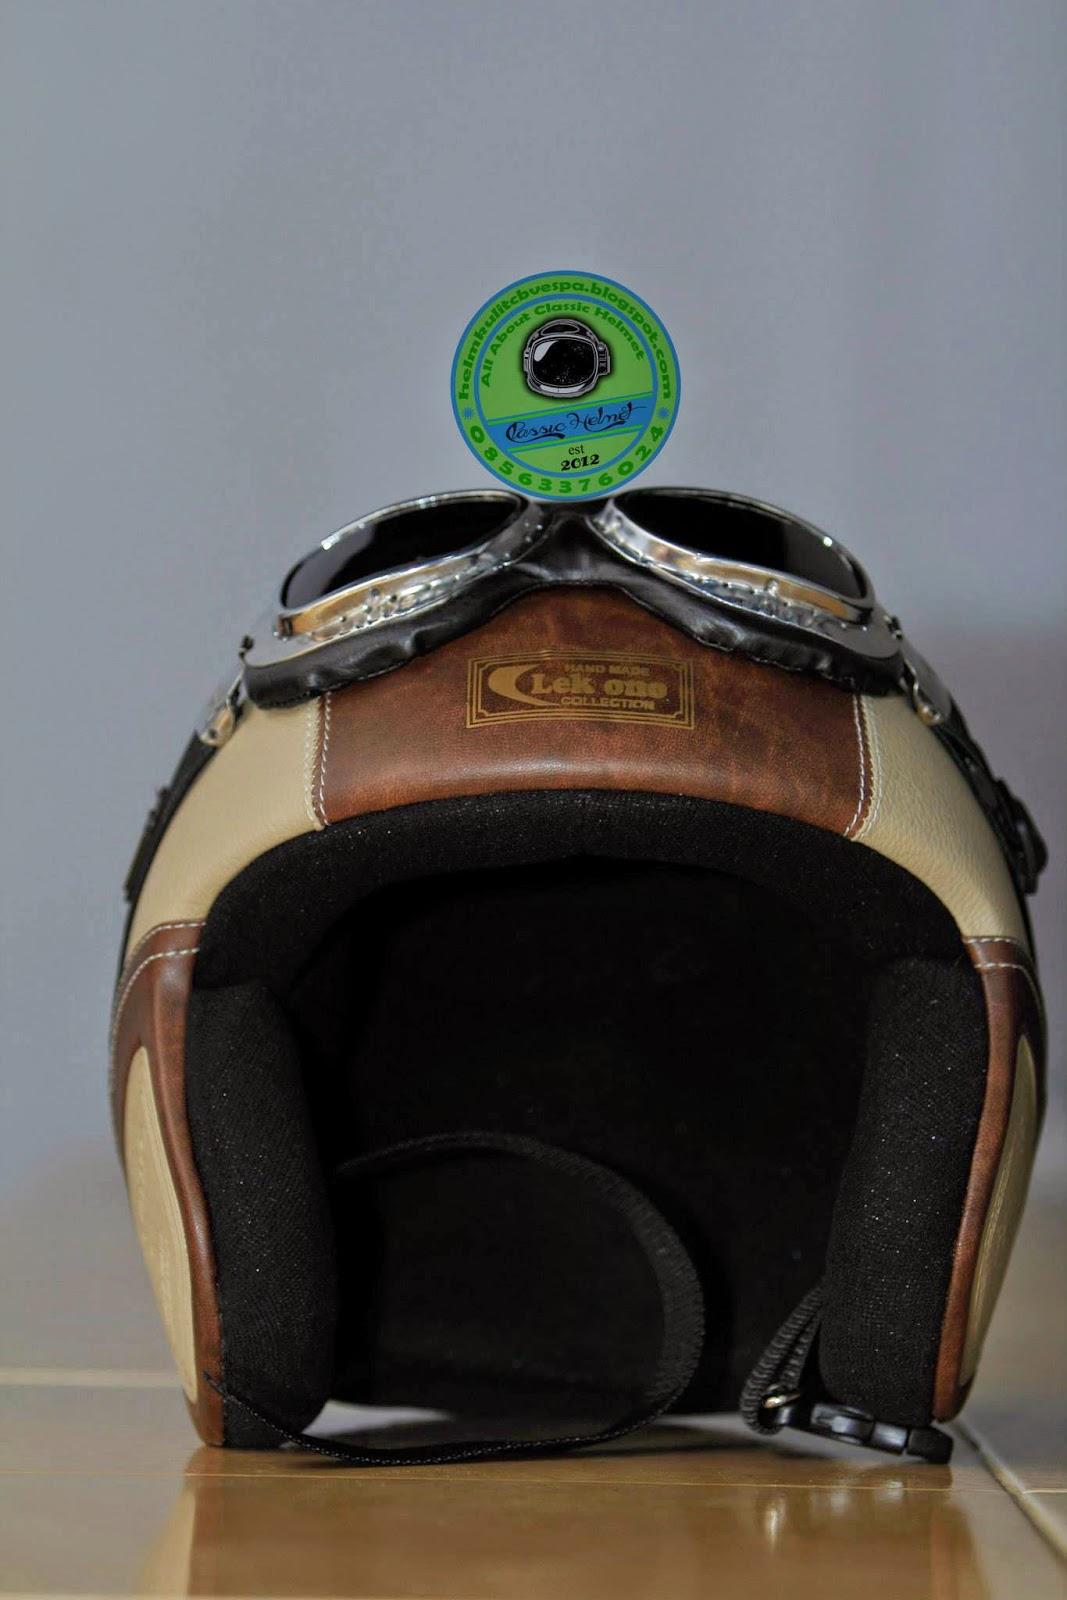 Helm Kulit Surabaya, Jual Helm Kulit, Helm Vespa, Helm CB, Helm Anak.